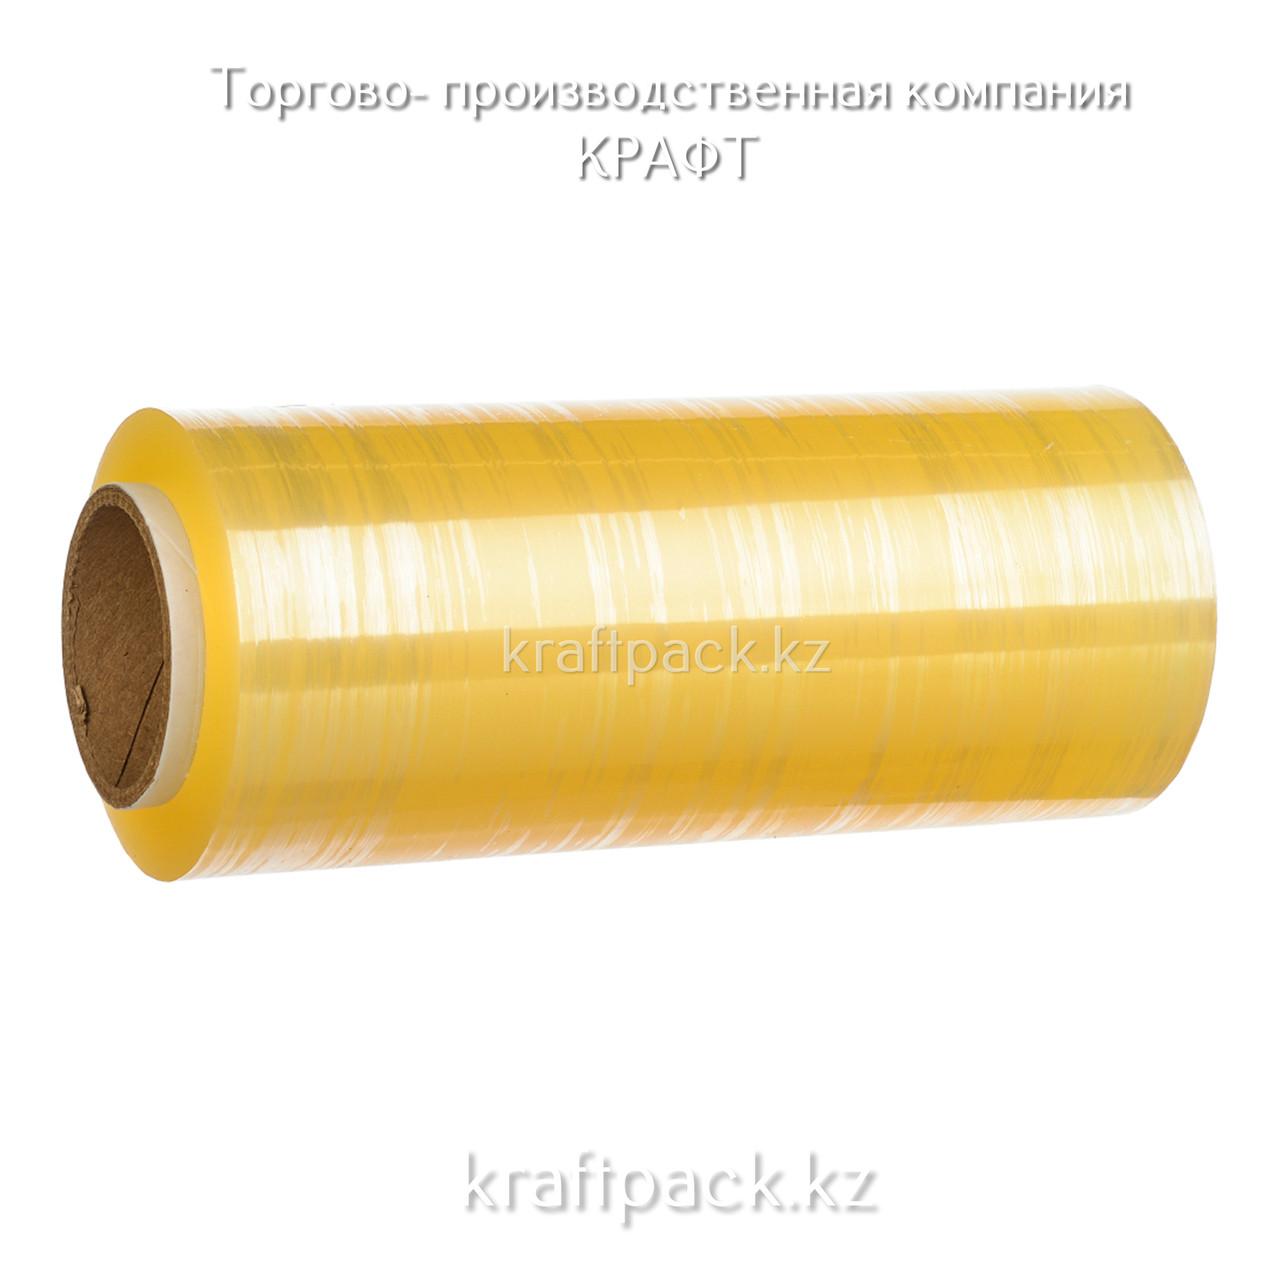 Пленка пищевая APF 450мм - намотка 700 метров, 8 мкр (Вес: 3,4 кг.)